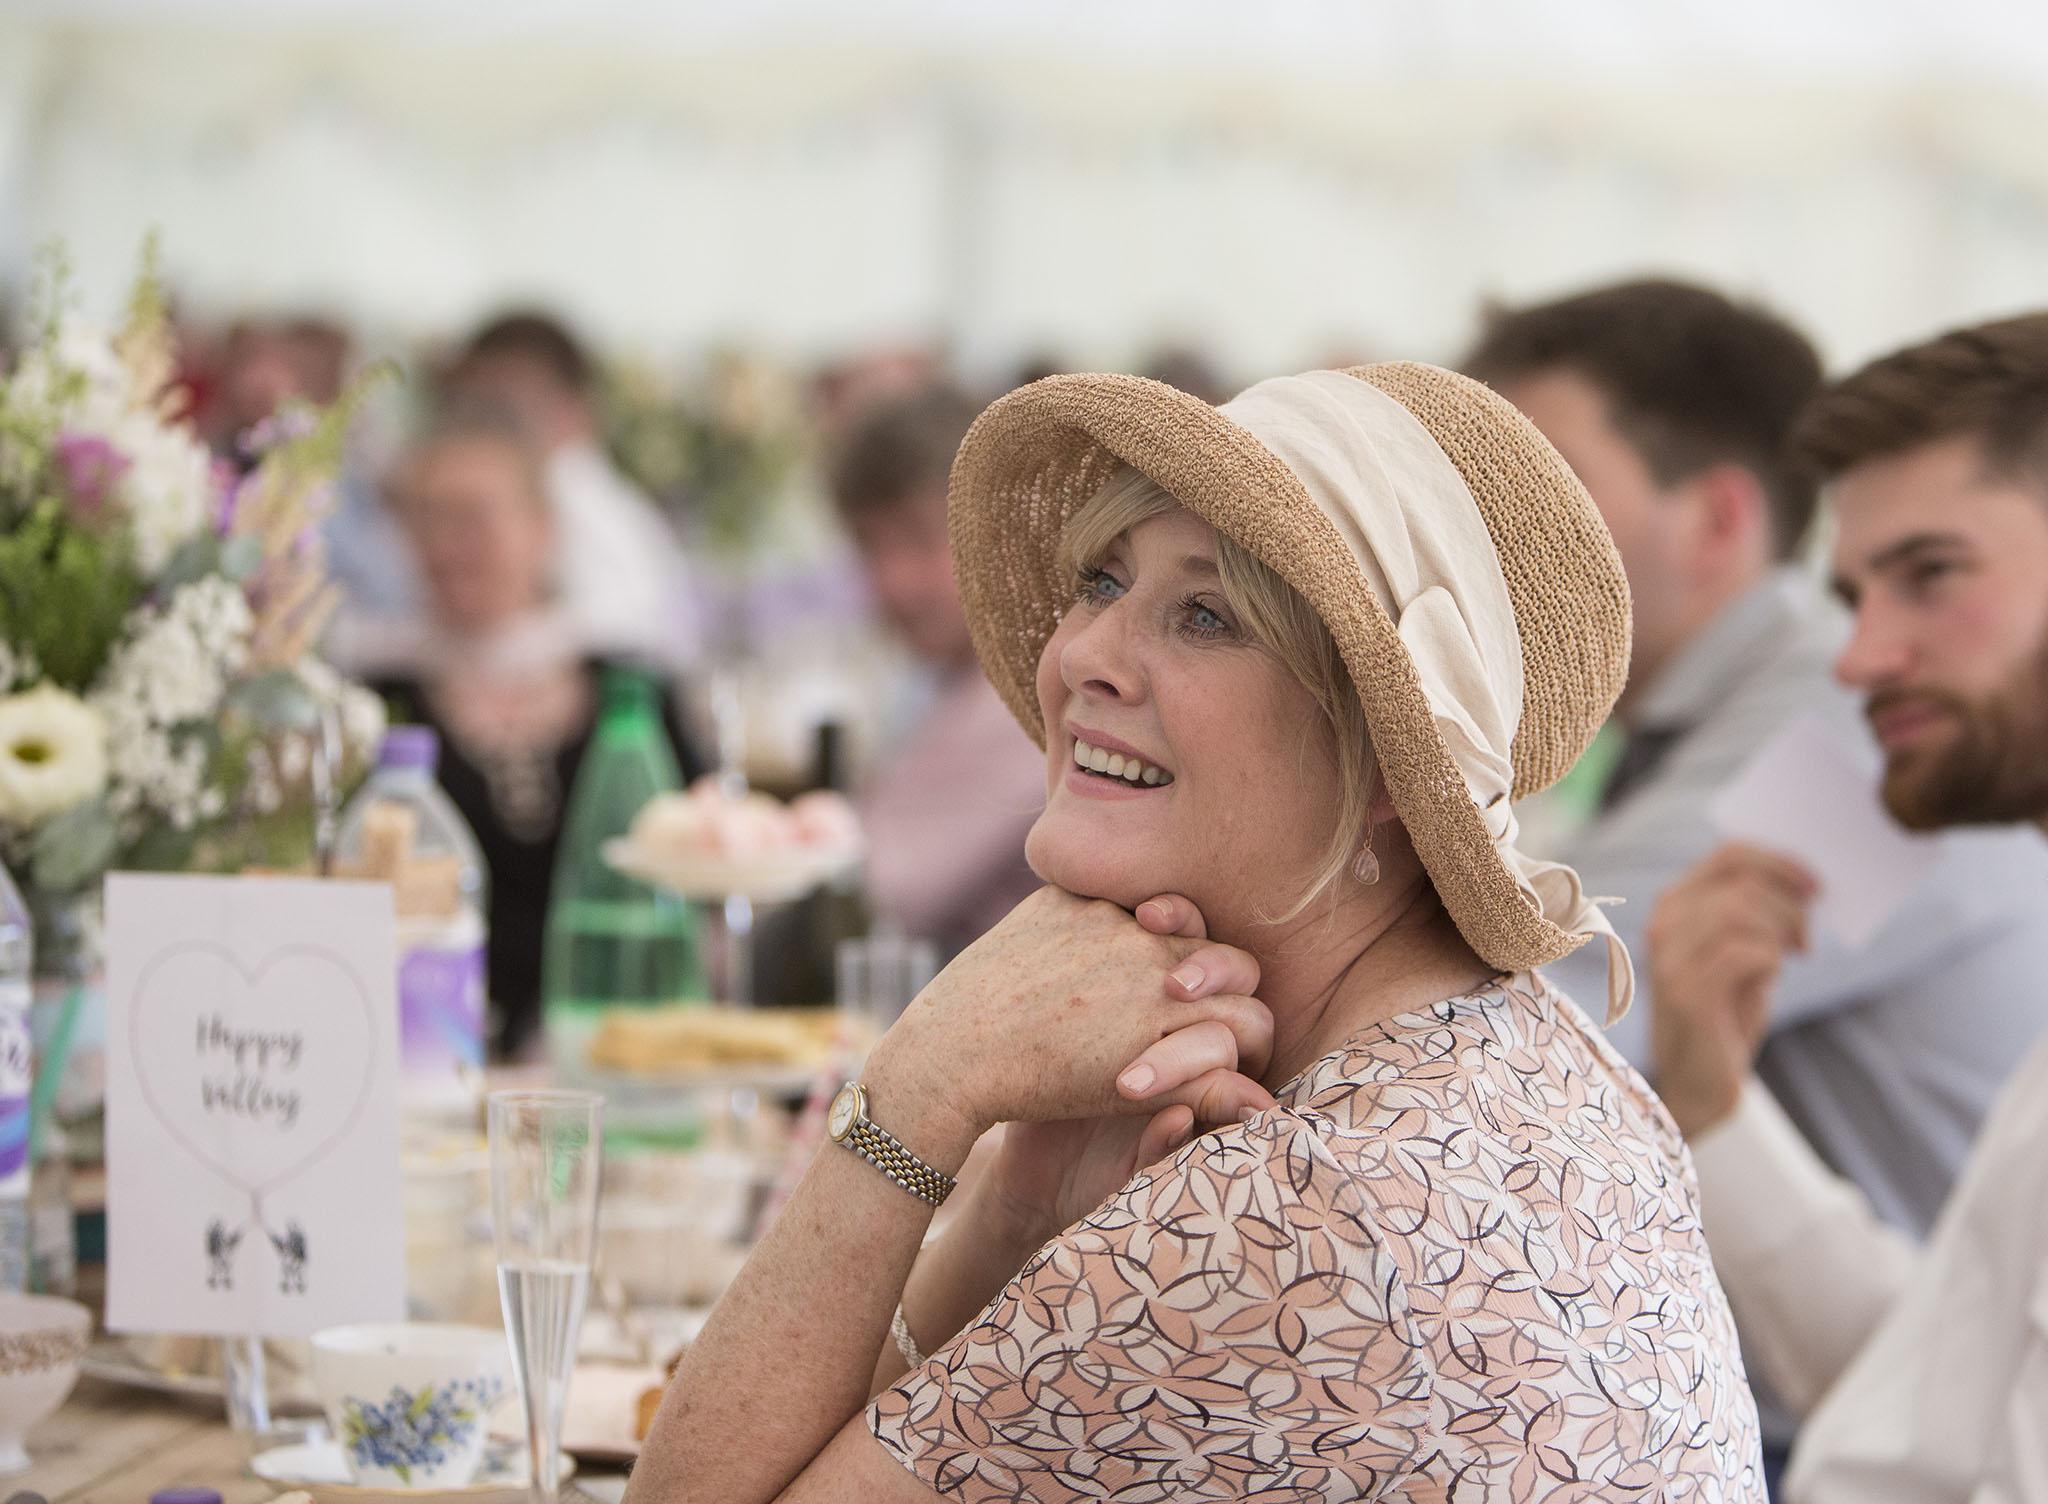 elizabethgphotography_kingslangley_hertfordshire_fineart_wedding_pottersbar_matt_katie_pegg_39.jpg